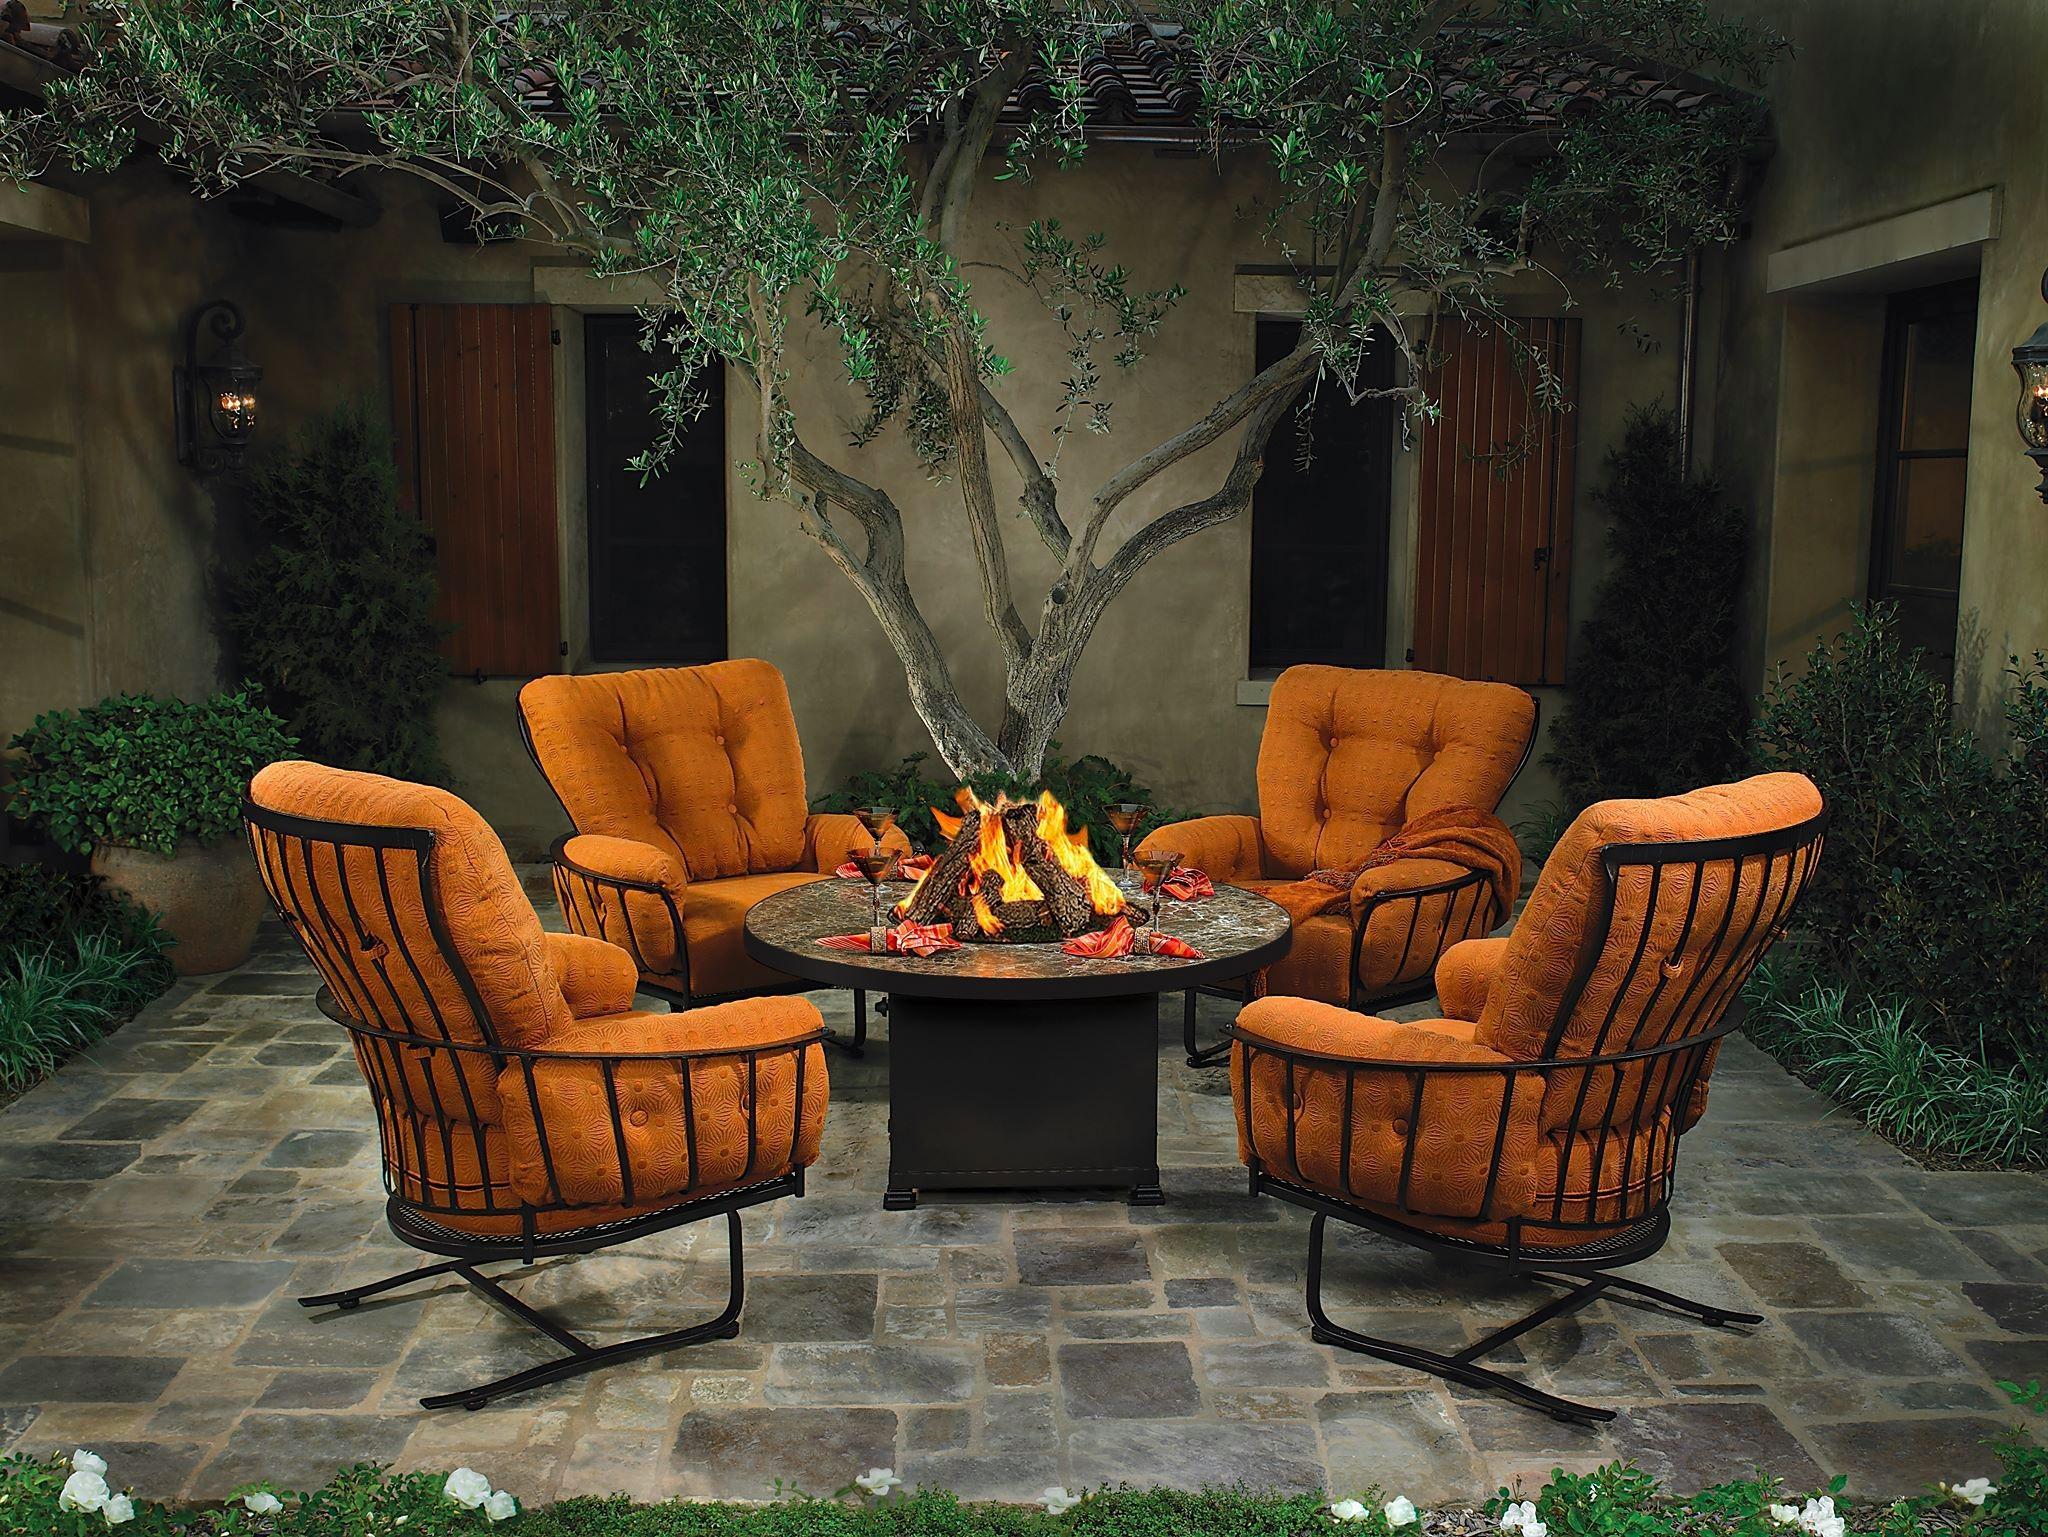 Statuary World, Patio U0026 Fireside 8401 N. I 35 Service Rd Oklahoma City, OK  Outdoor Furniture   MapQuest